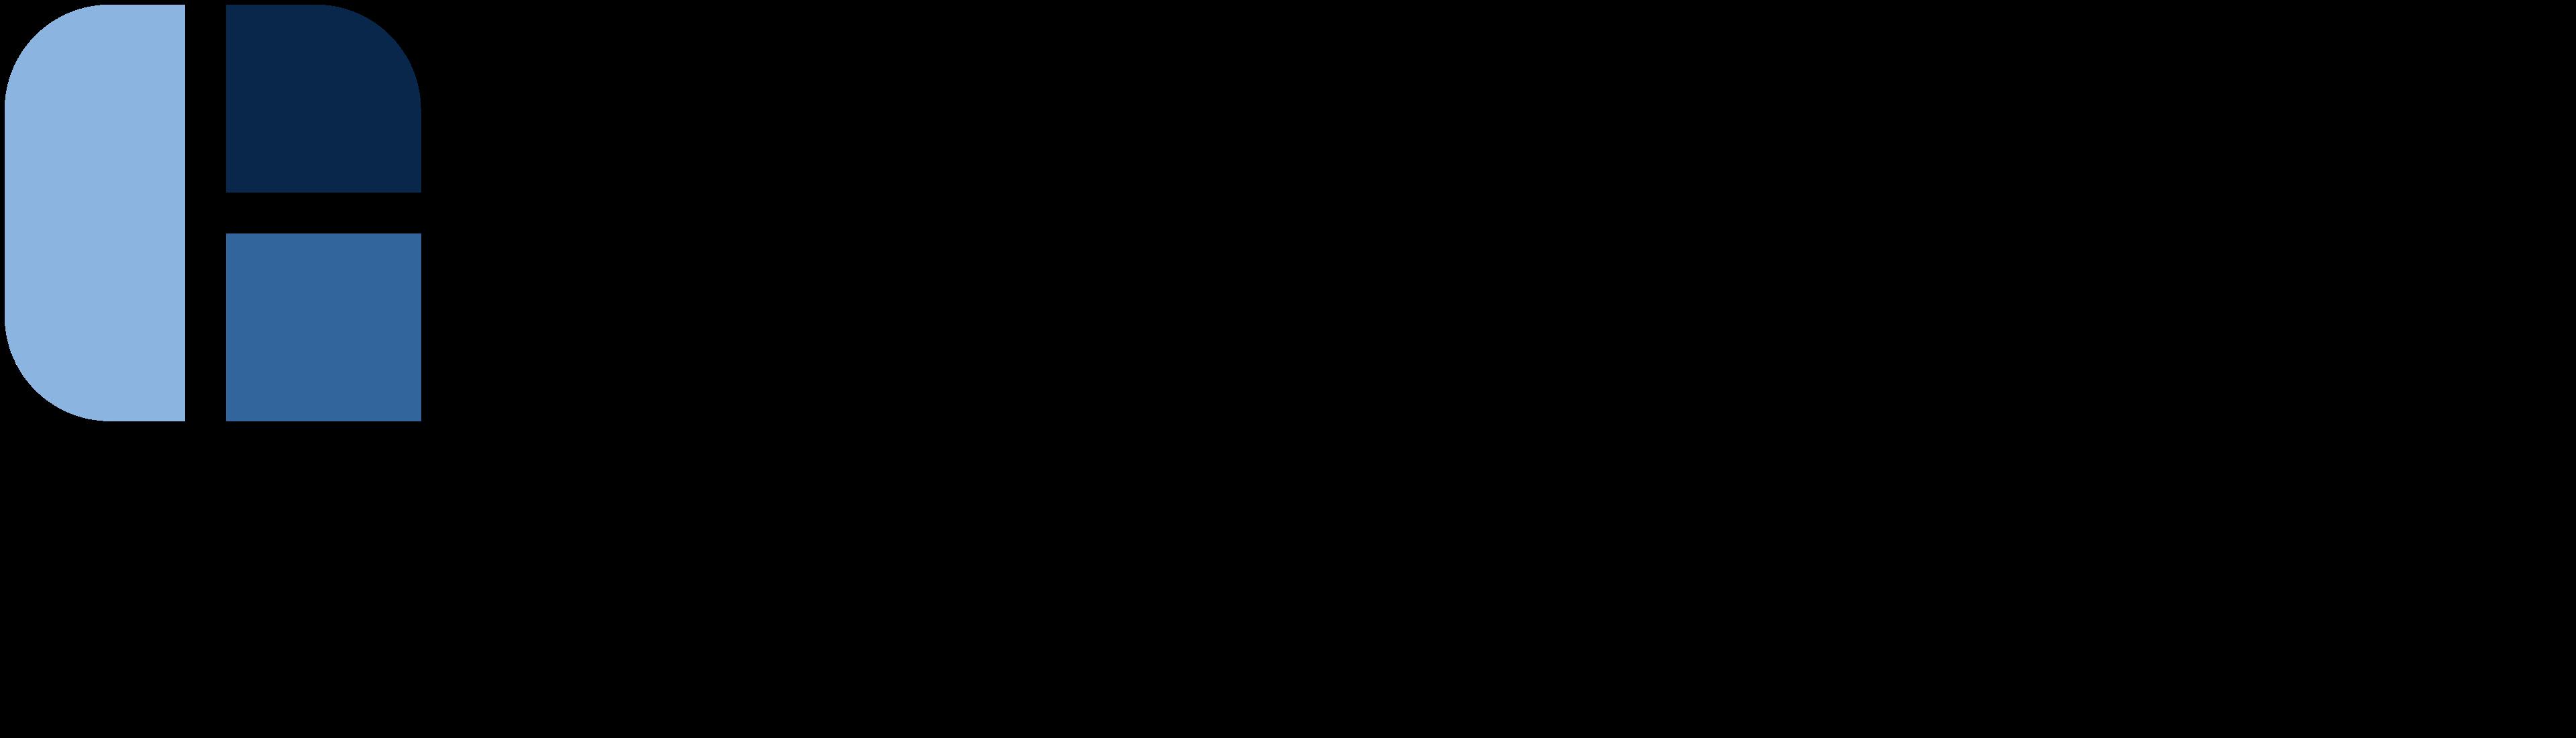 E8pgvpco4ncqr2j6gx6g